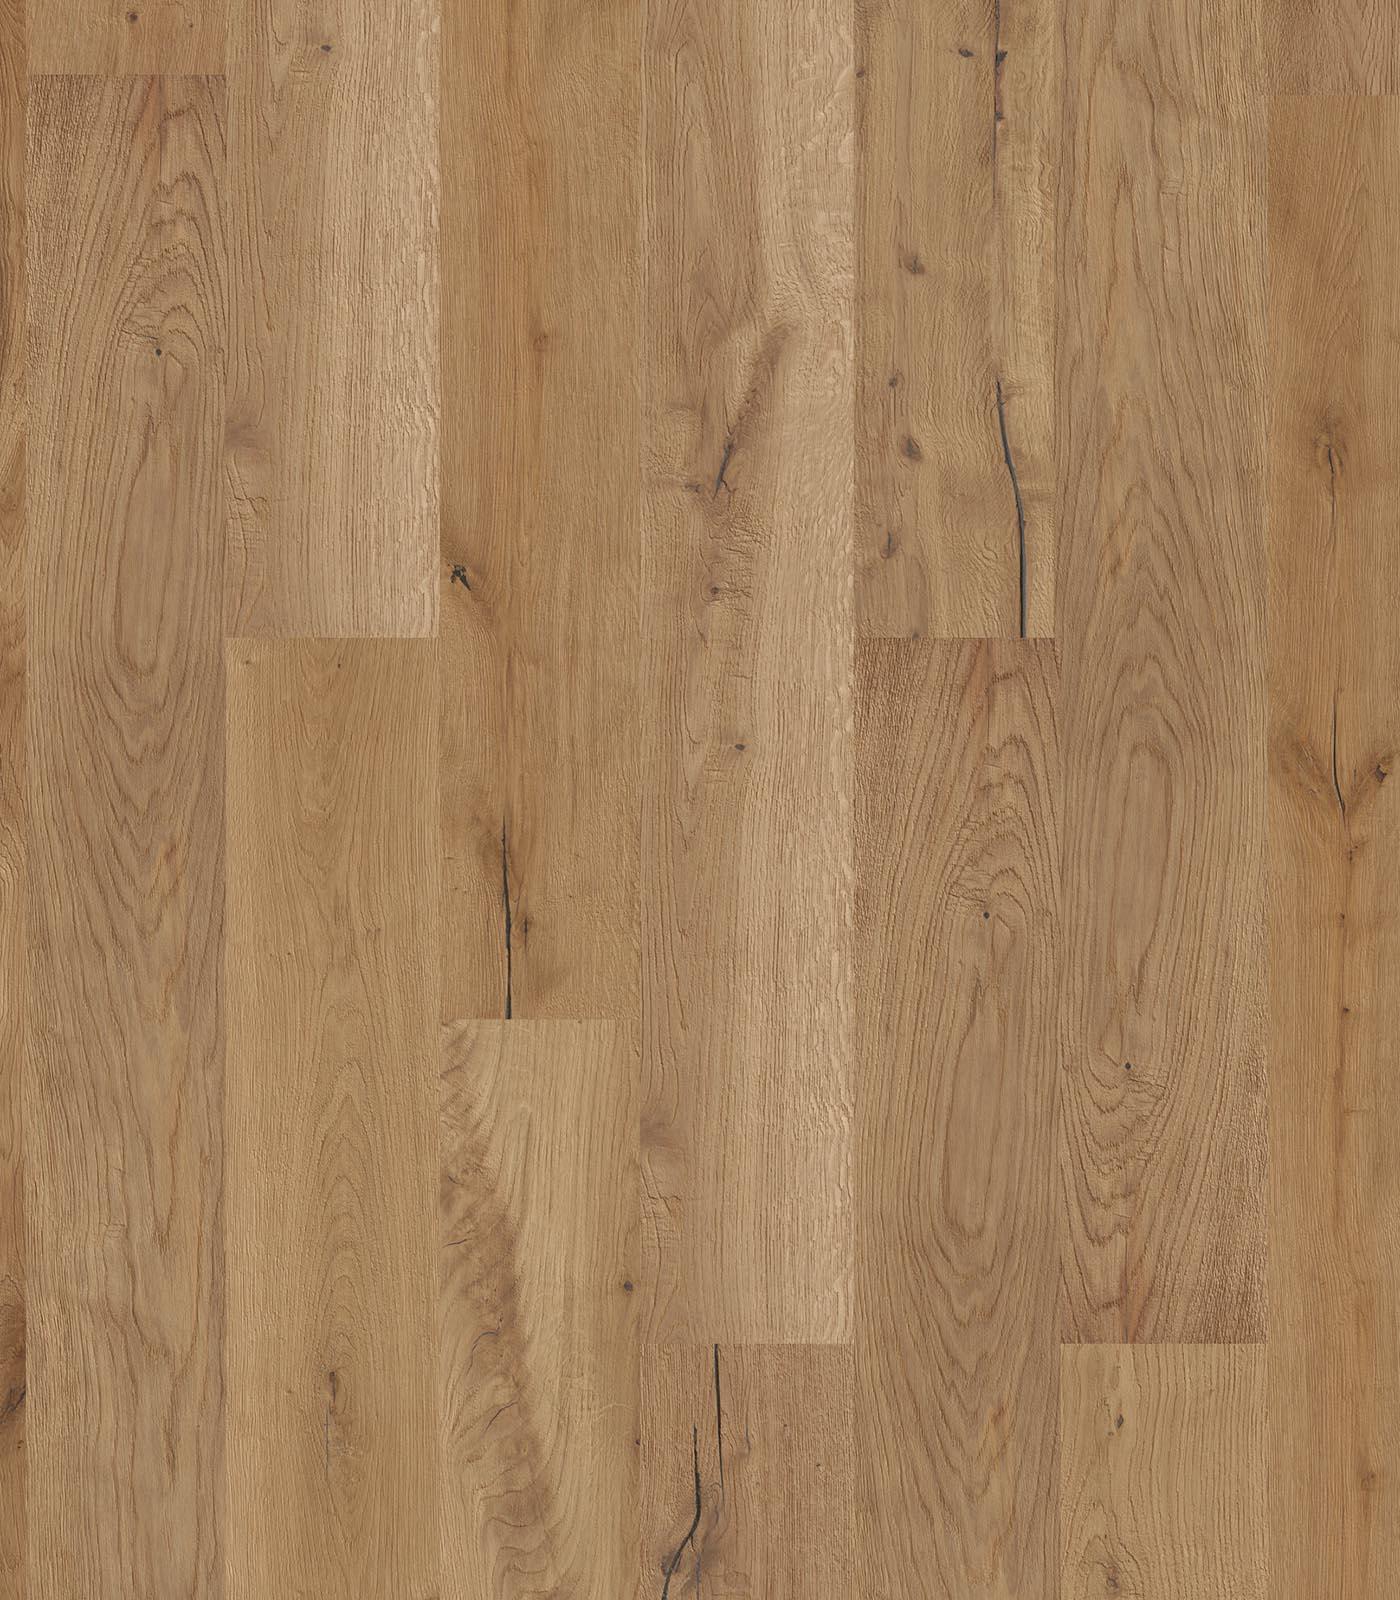 Grampians-Antique Collection-European Oak Floors-flat